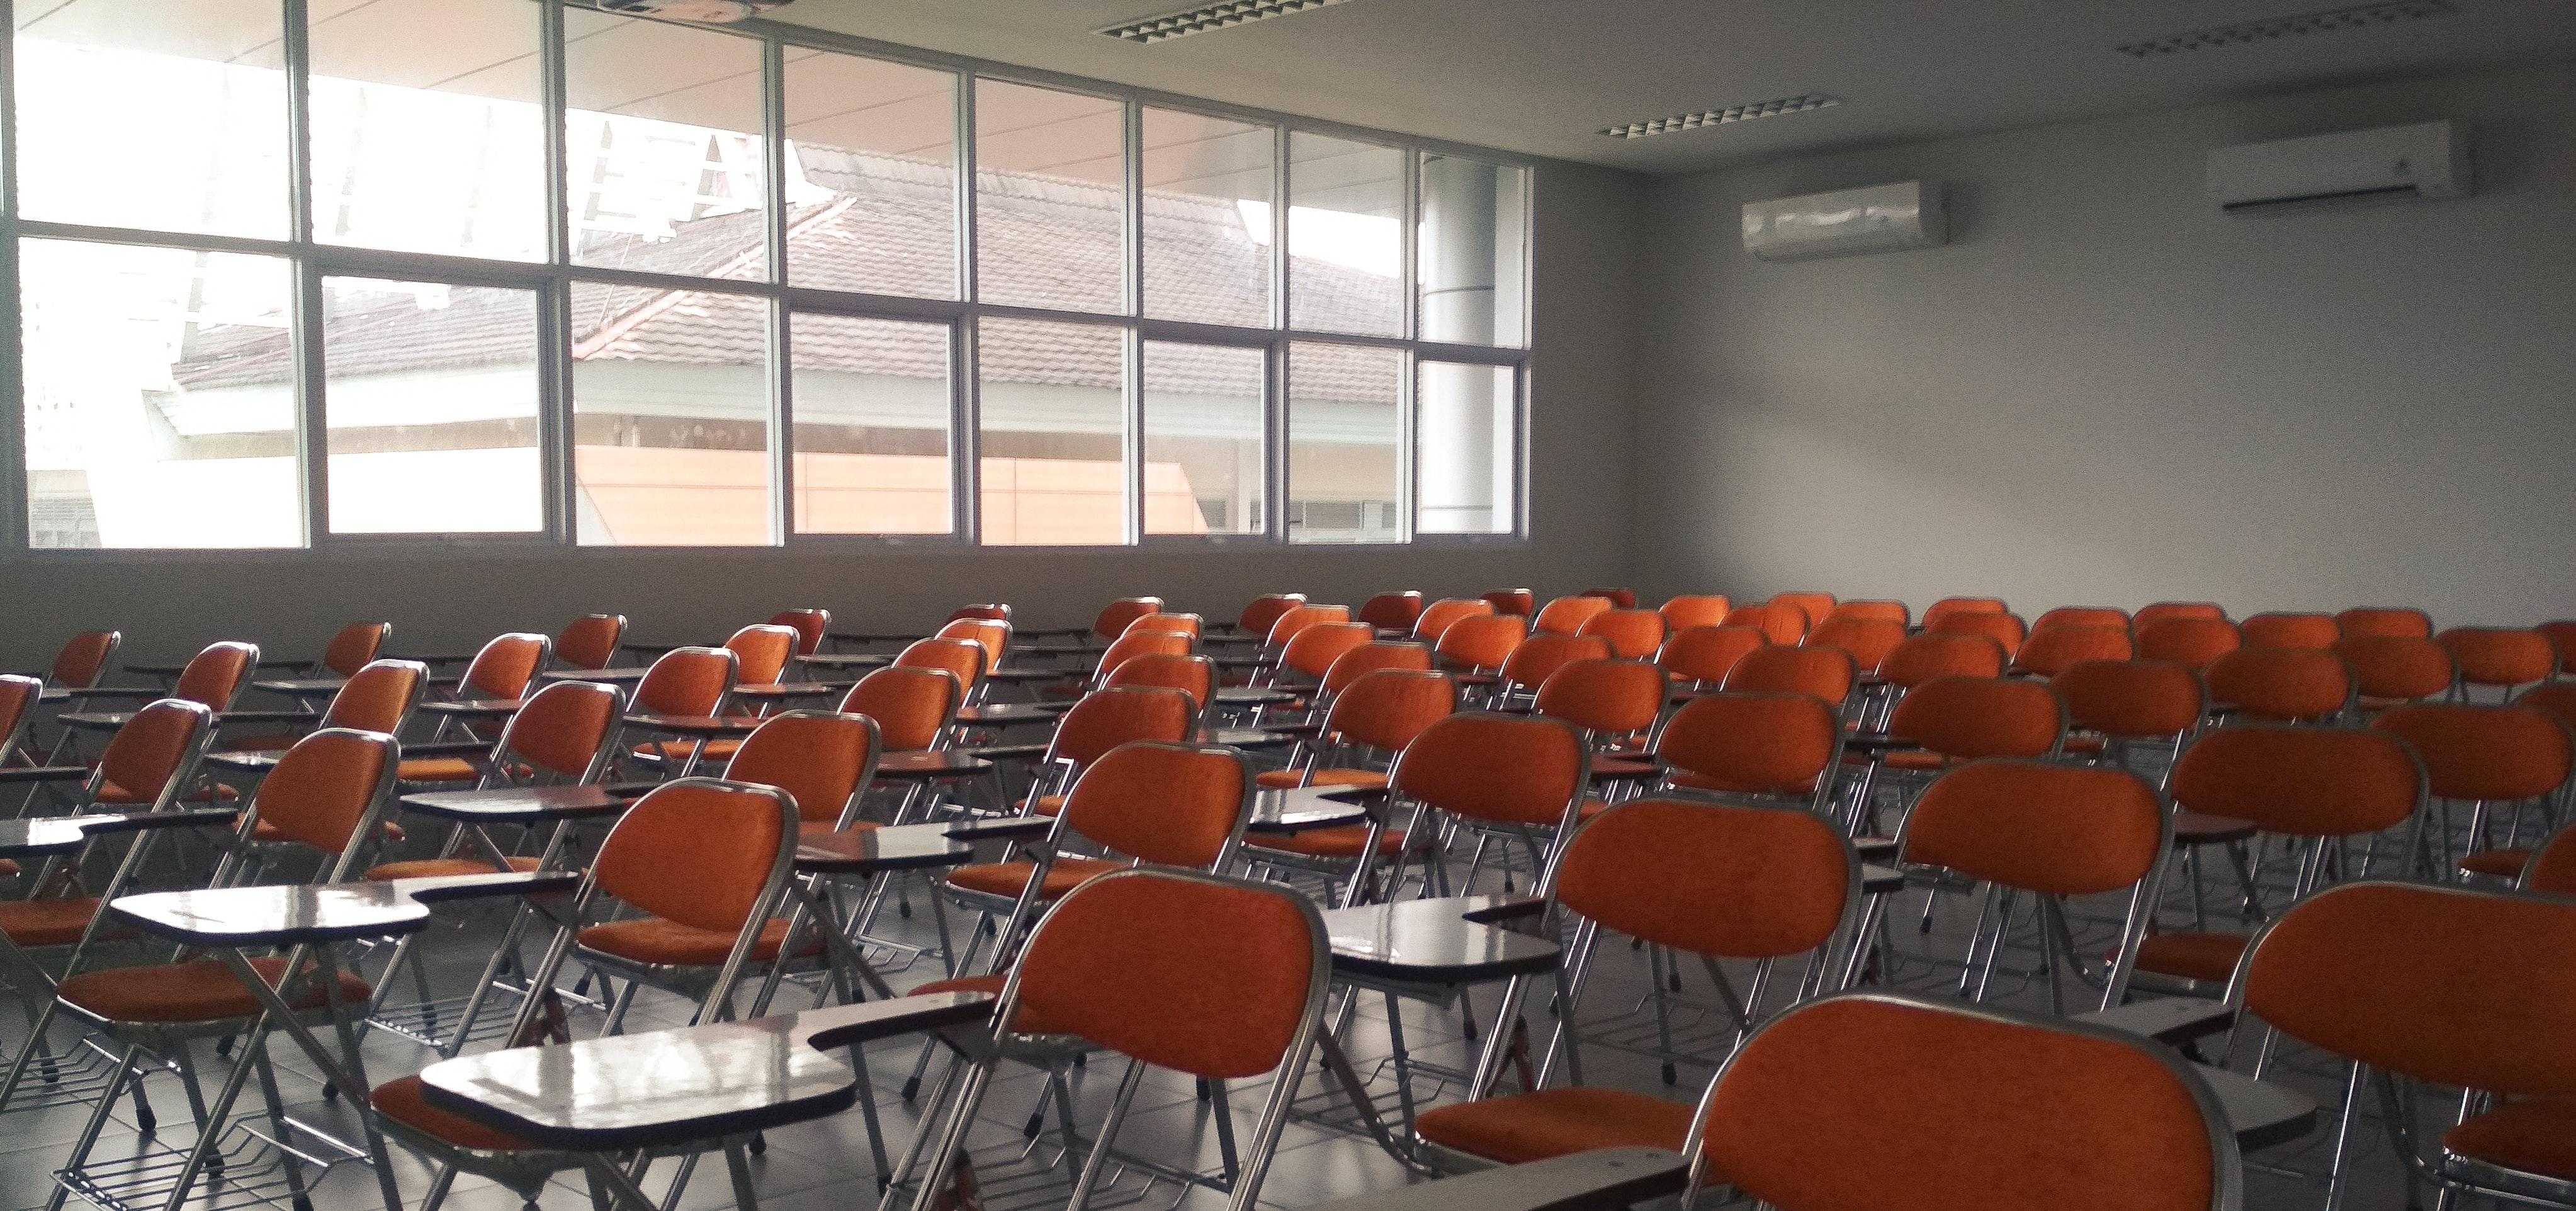 School Days Always: The Archetype of Education